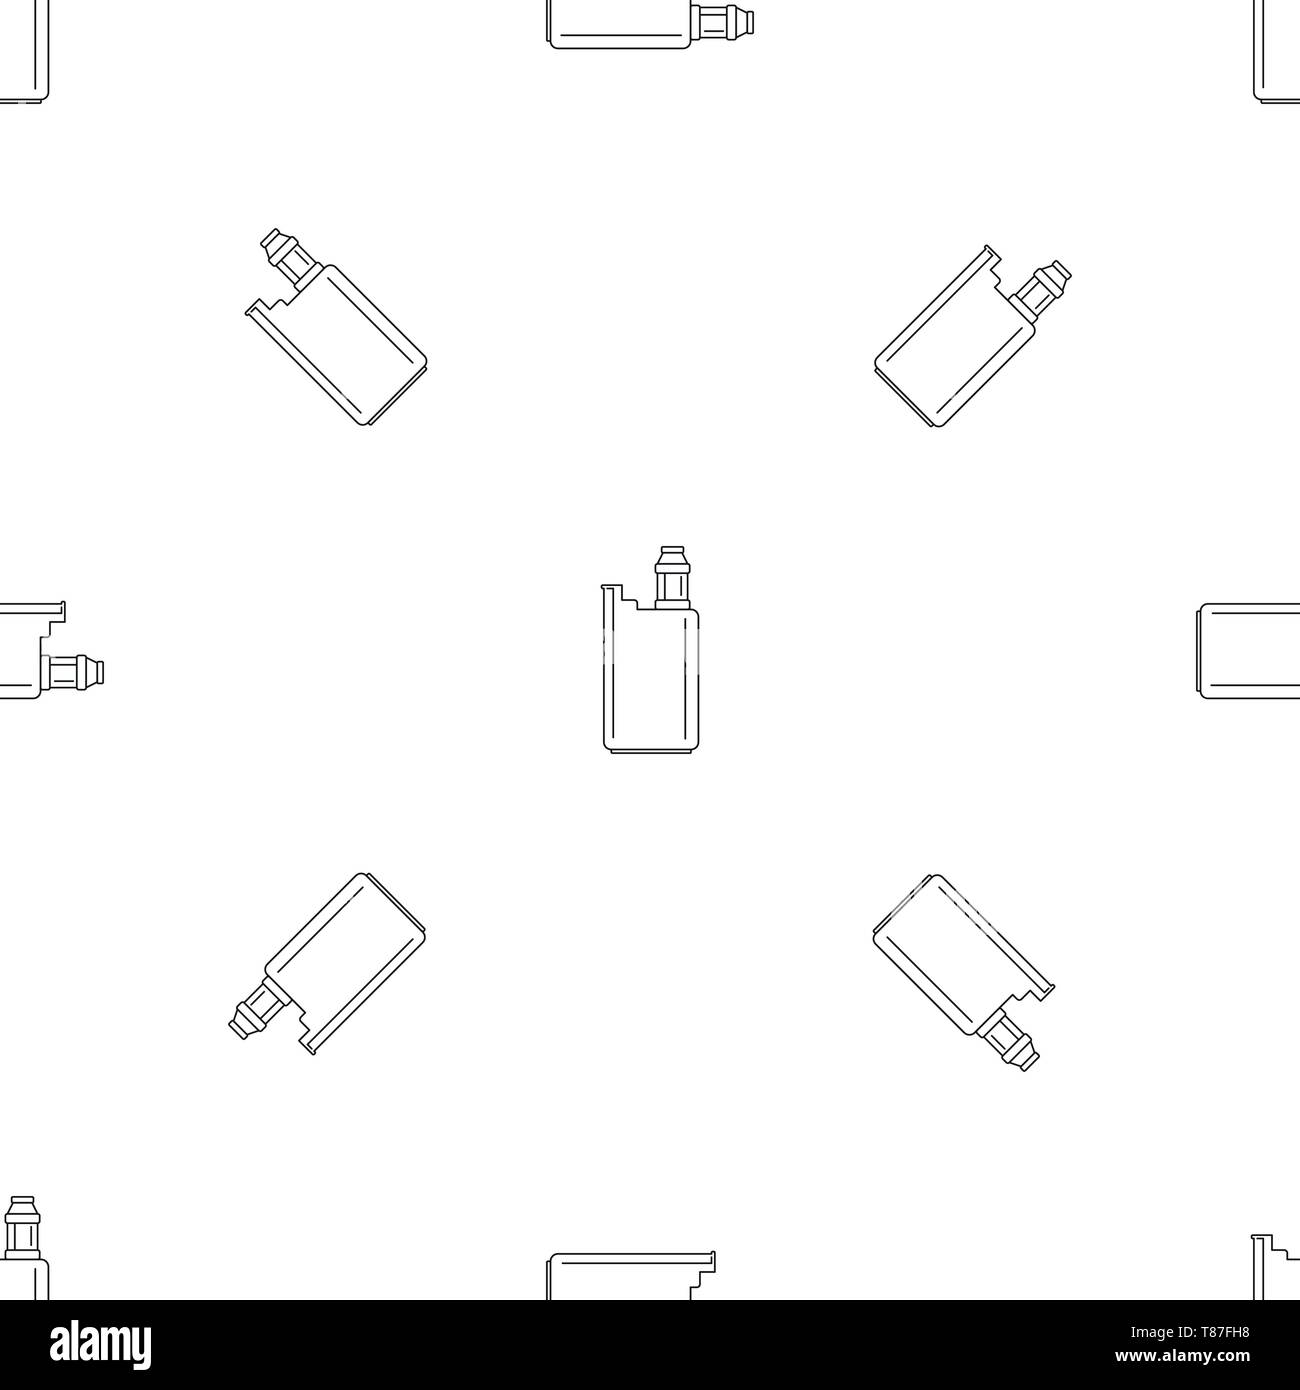 Vape box pattern seamless vector repeat geometric for any web design - Stock Image